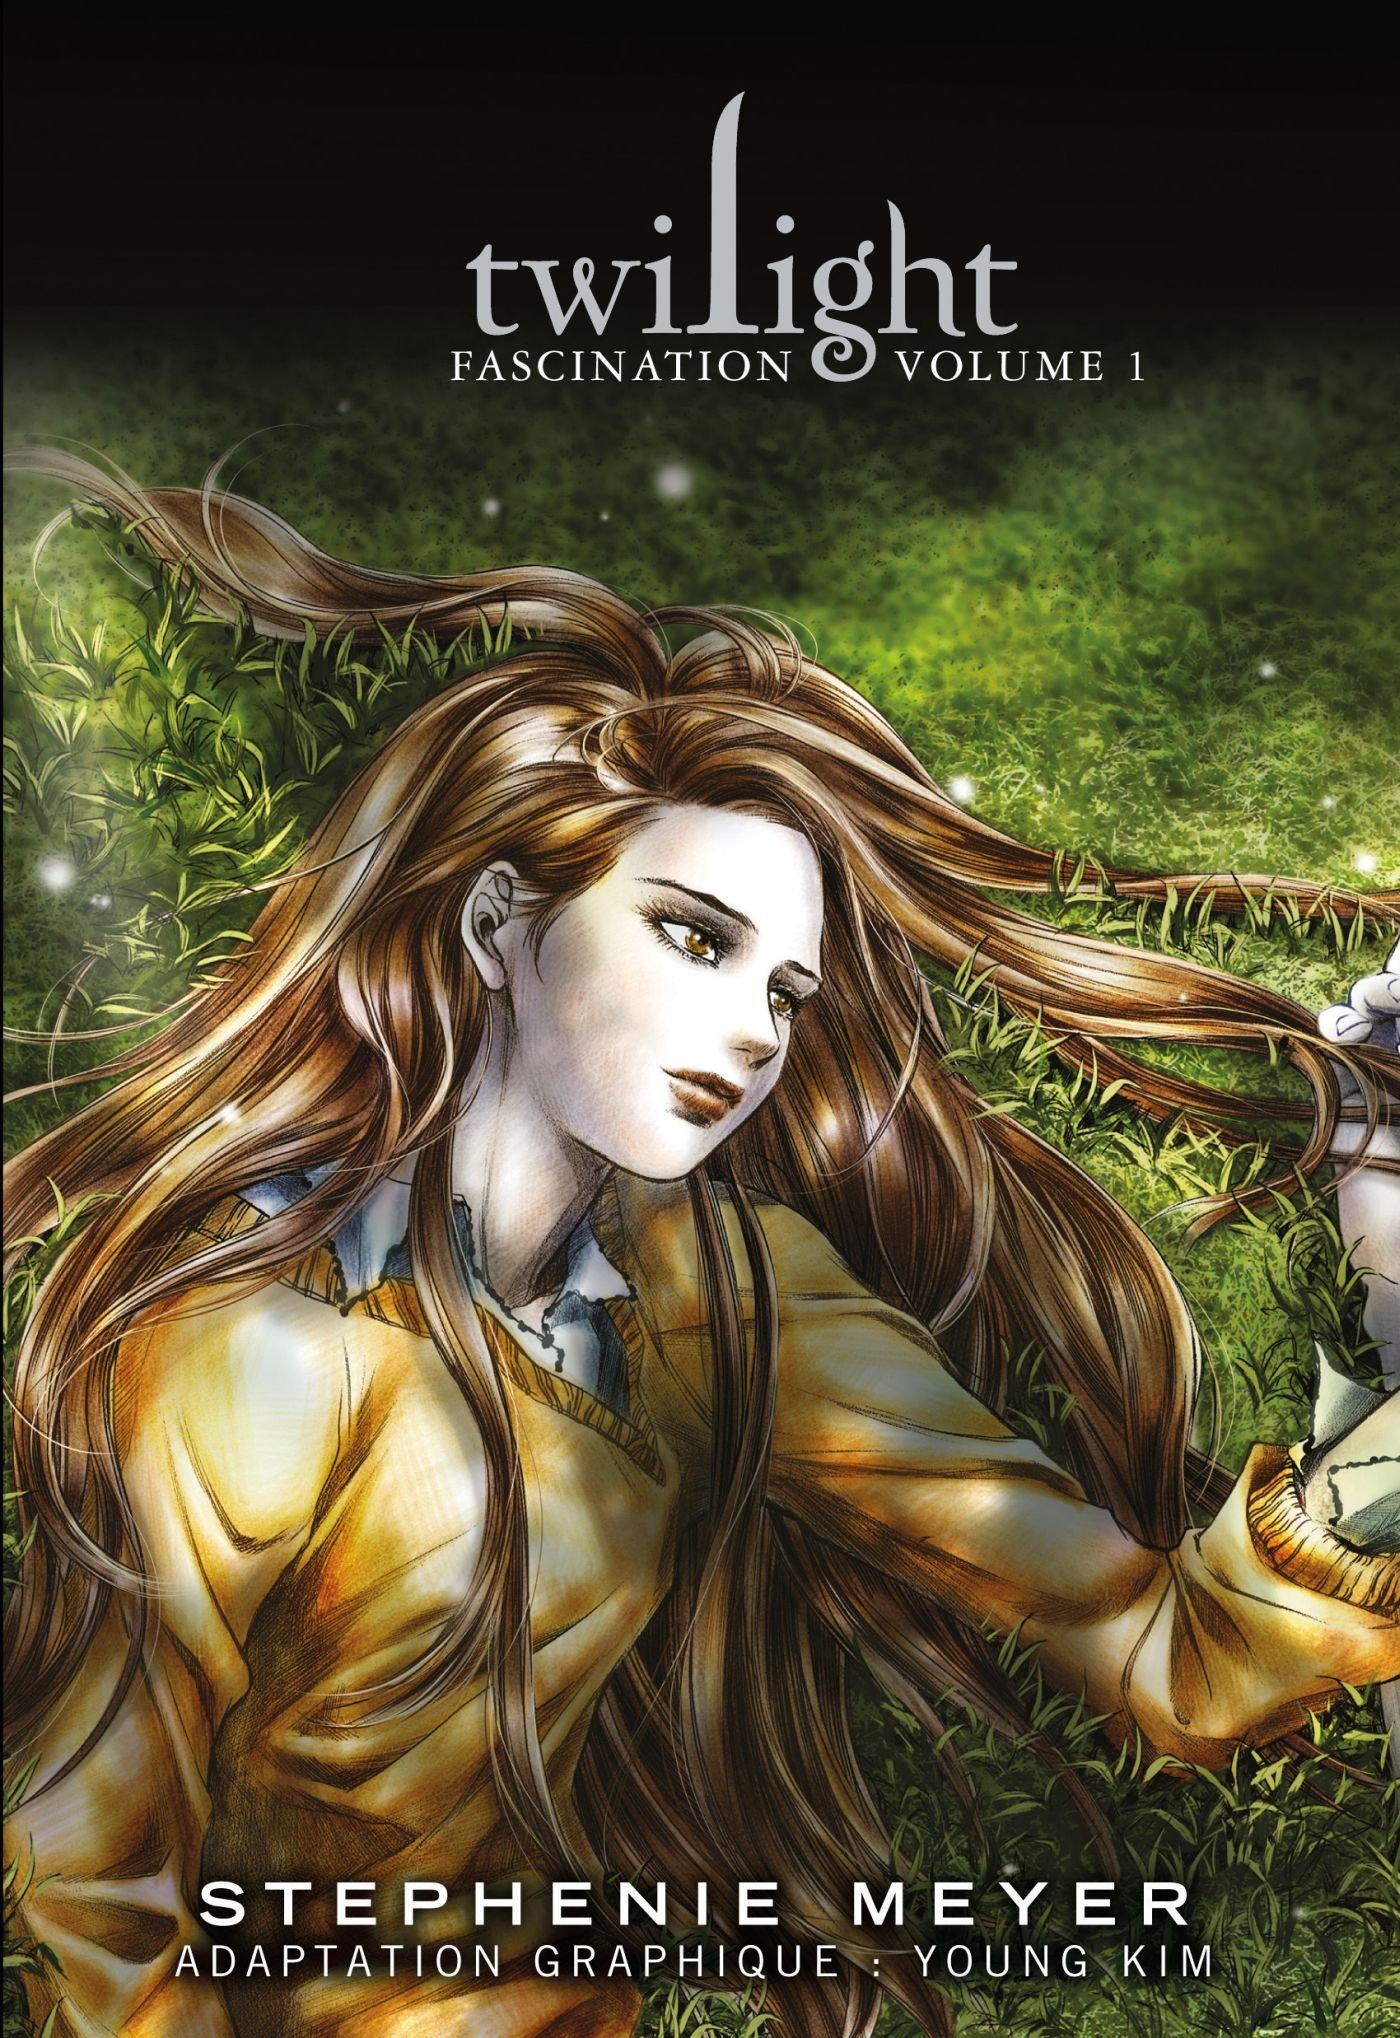 Saga Twilight T01 Twilight Fascination 1 Saga Twilight 1 French Edition Stephenie Meyer Kim Young 9782811602451 Amazon Com Books